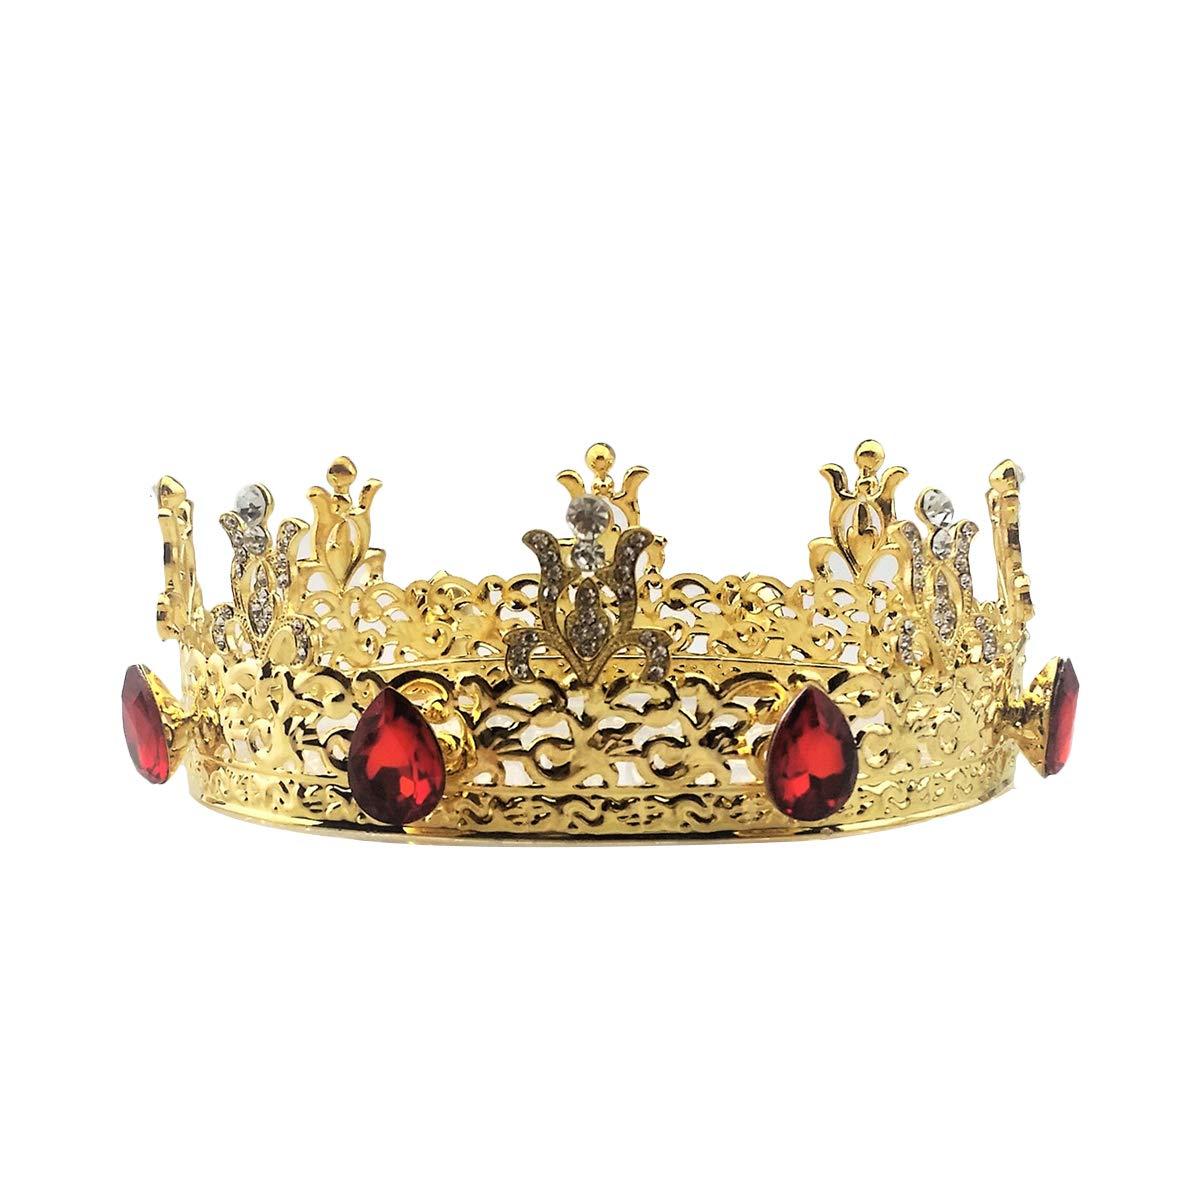 TINKSKY Baroque Bridal Crown Tiara Crystal Bride Round Headband Wedding Tiara Full Crown Wedding Accessories (Golden)